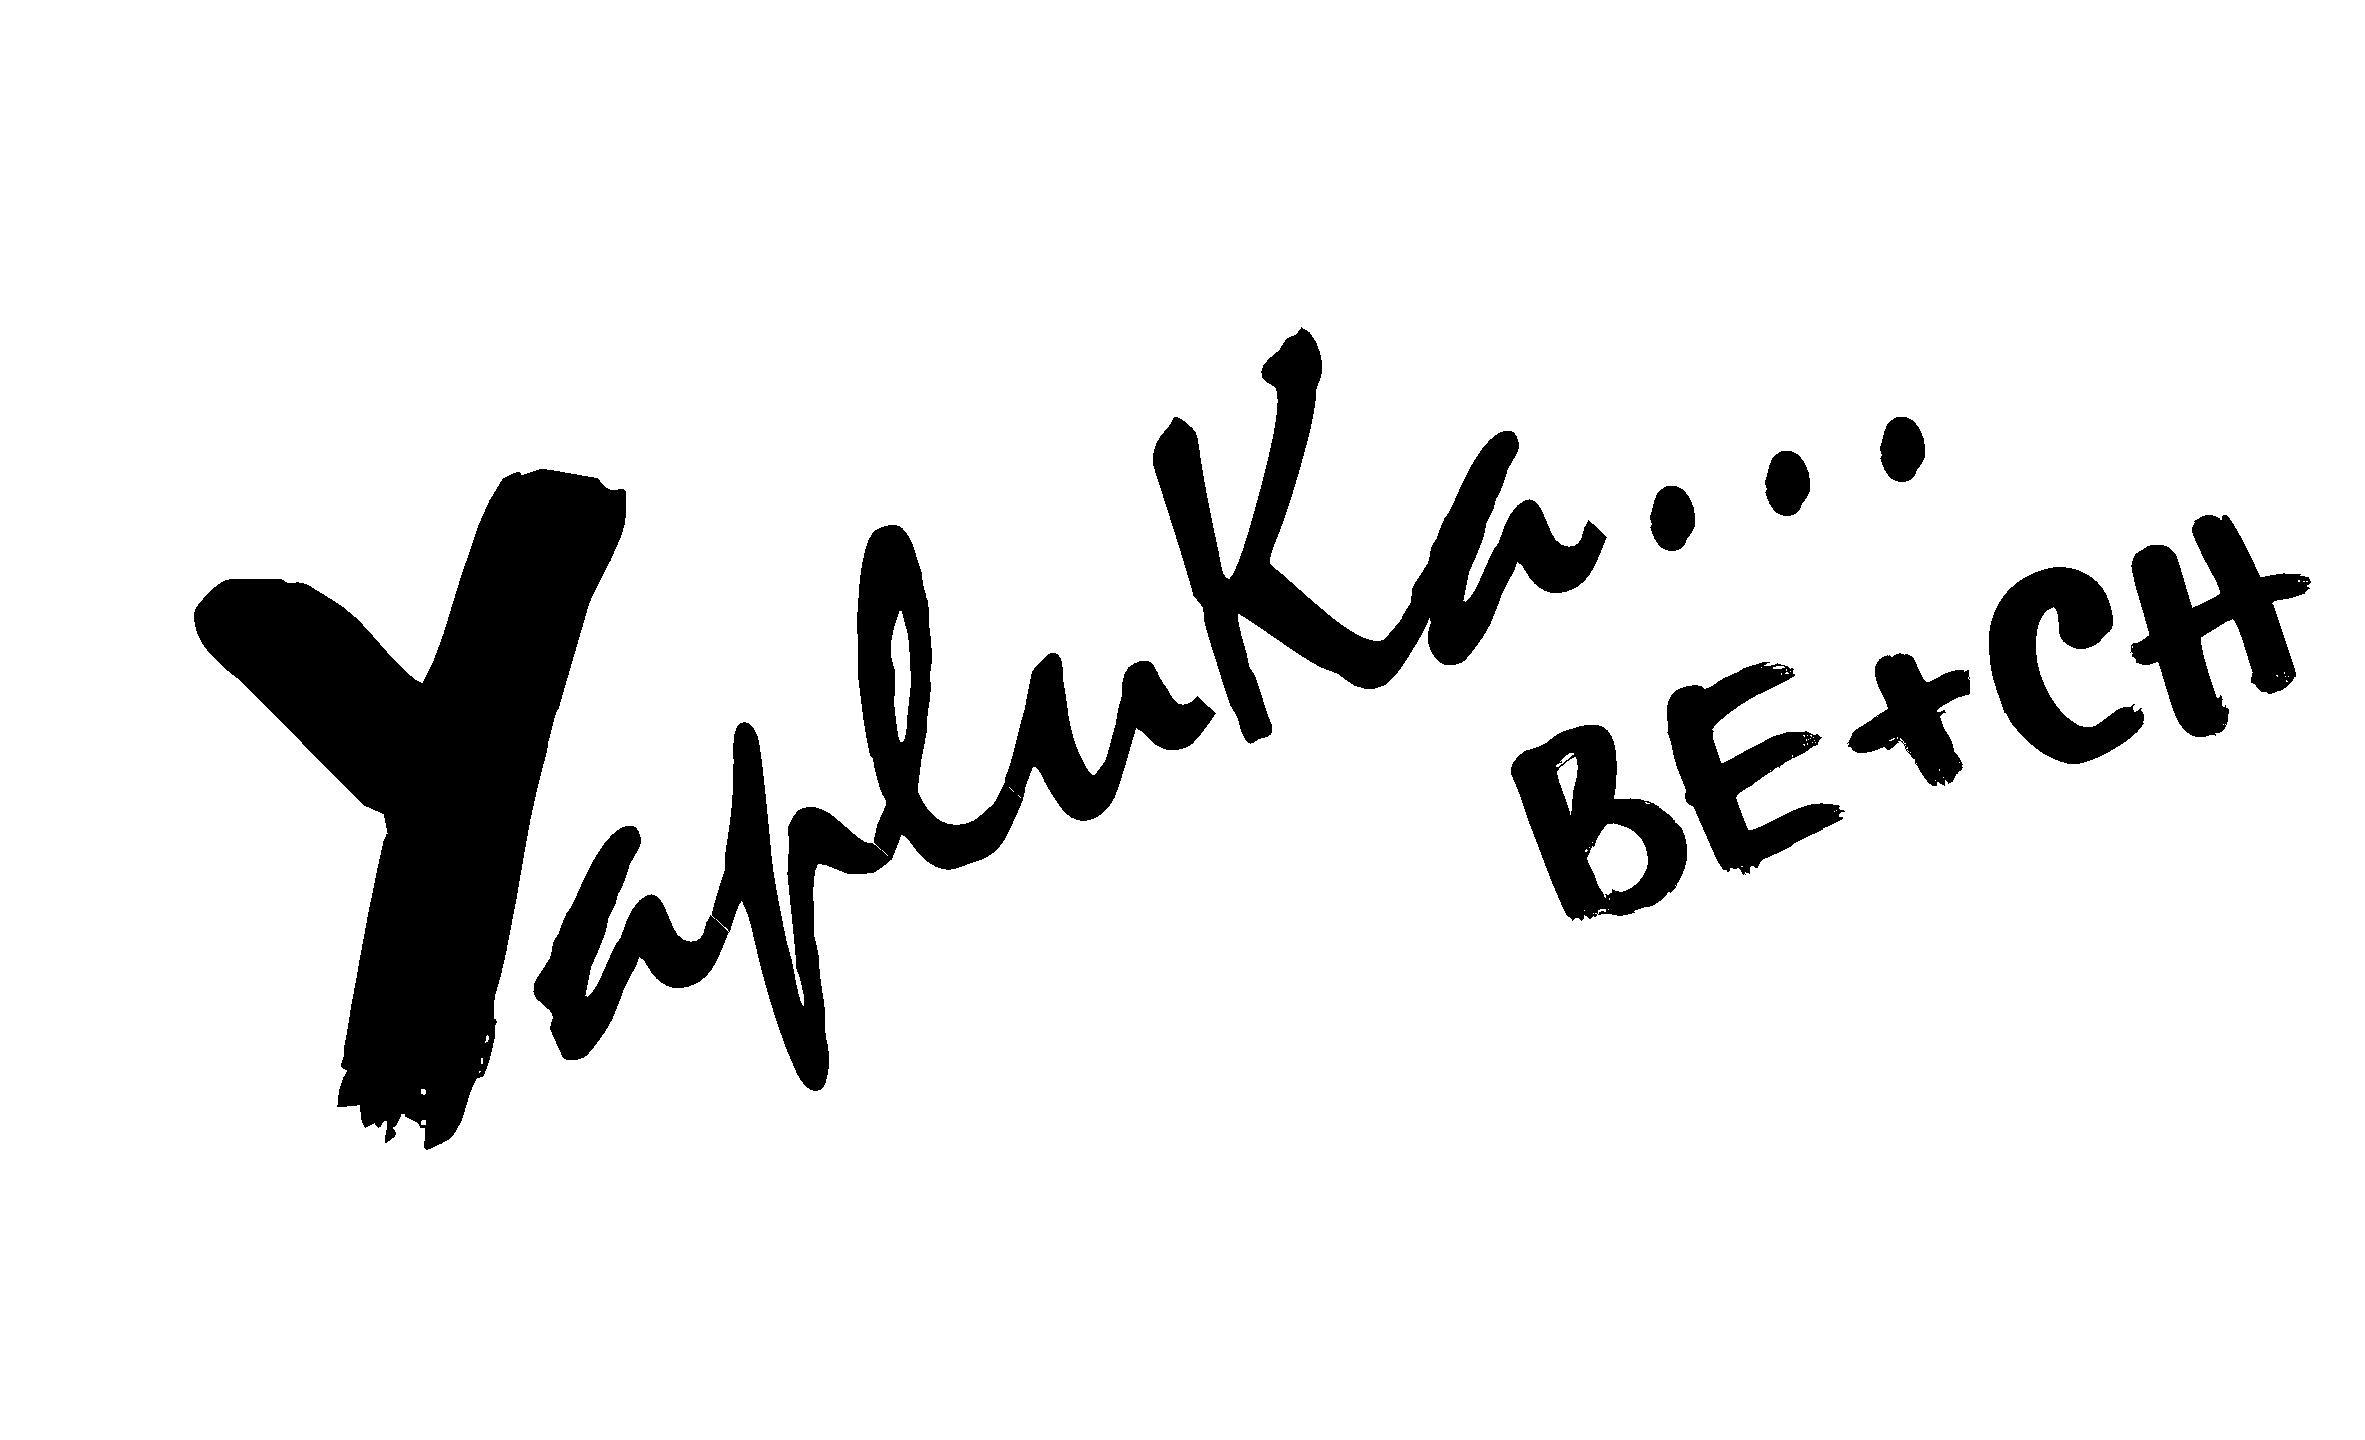 logo YAPLUKA_BeCH